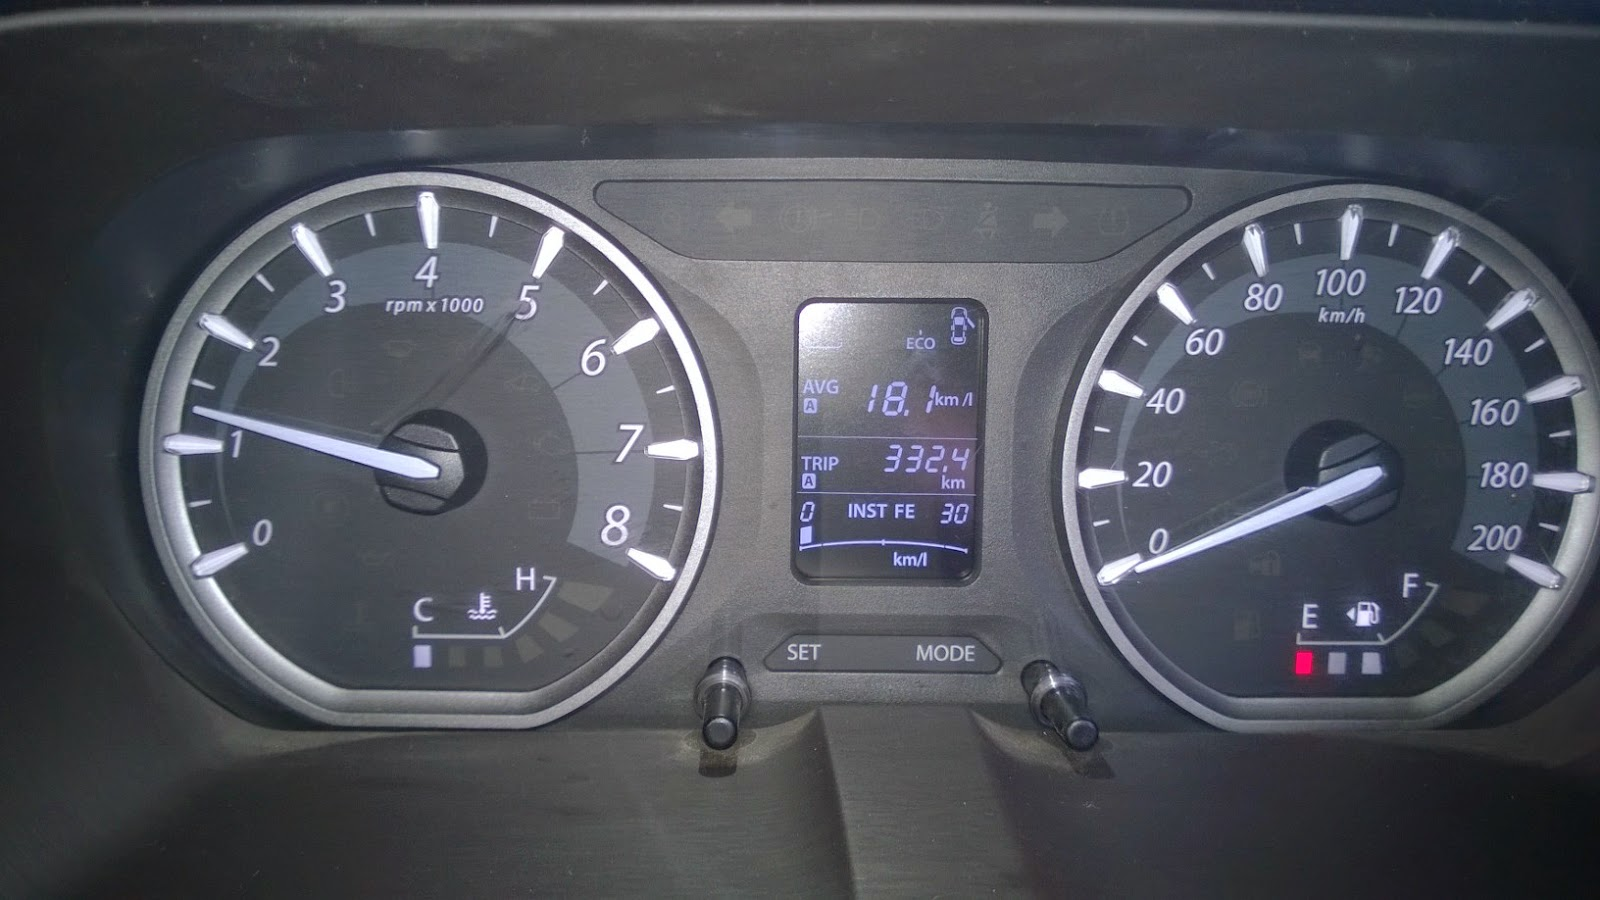 Tata zest mileage test